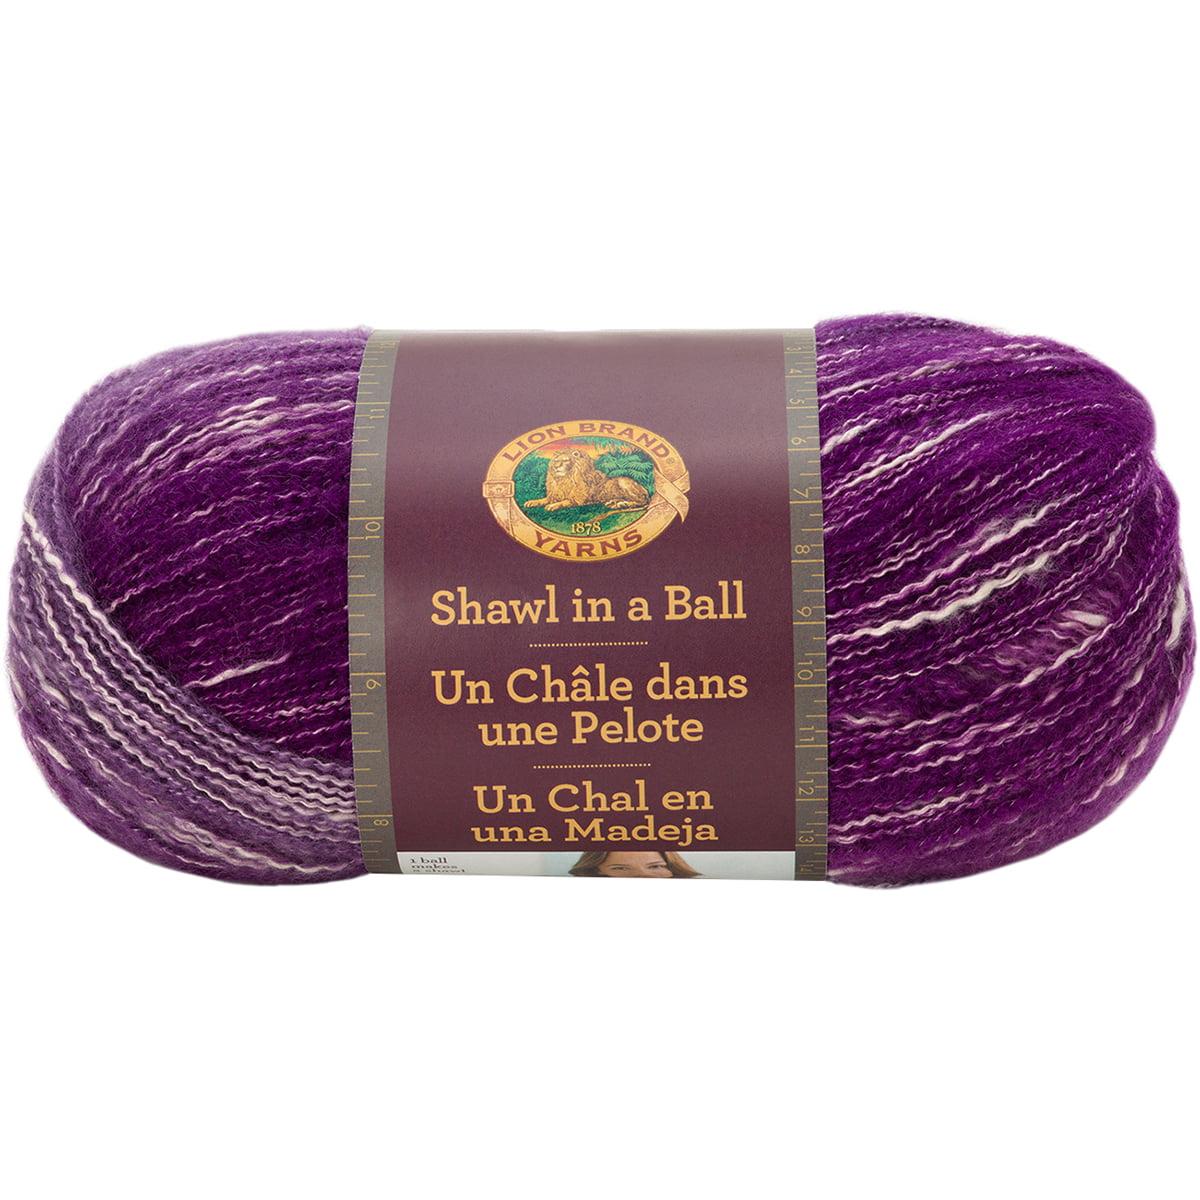 Shawl In A Ball Yarn - image 1 de 4